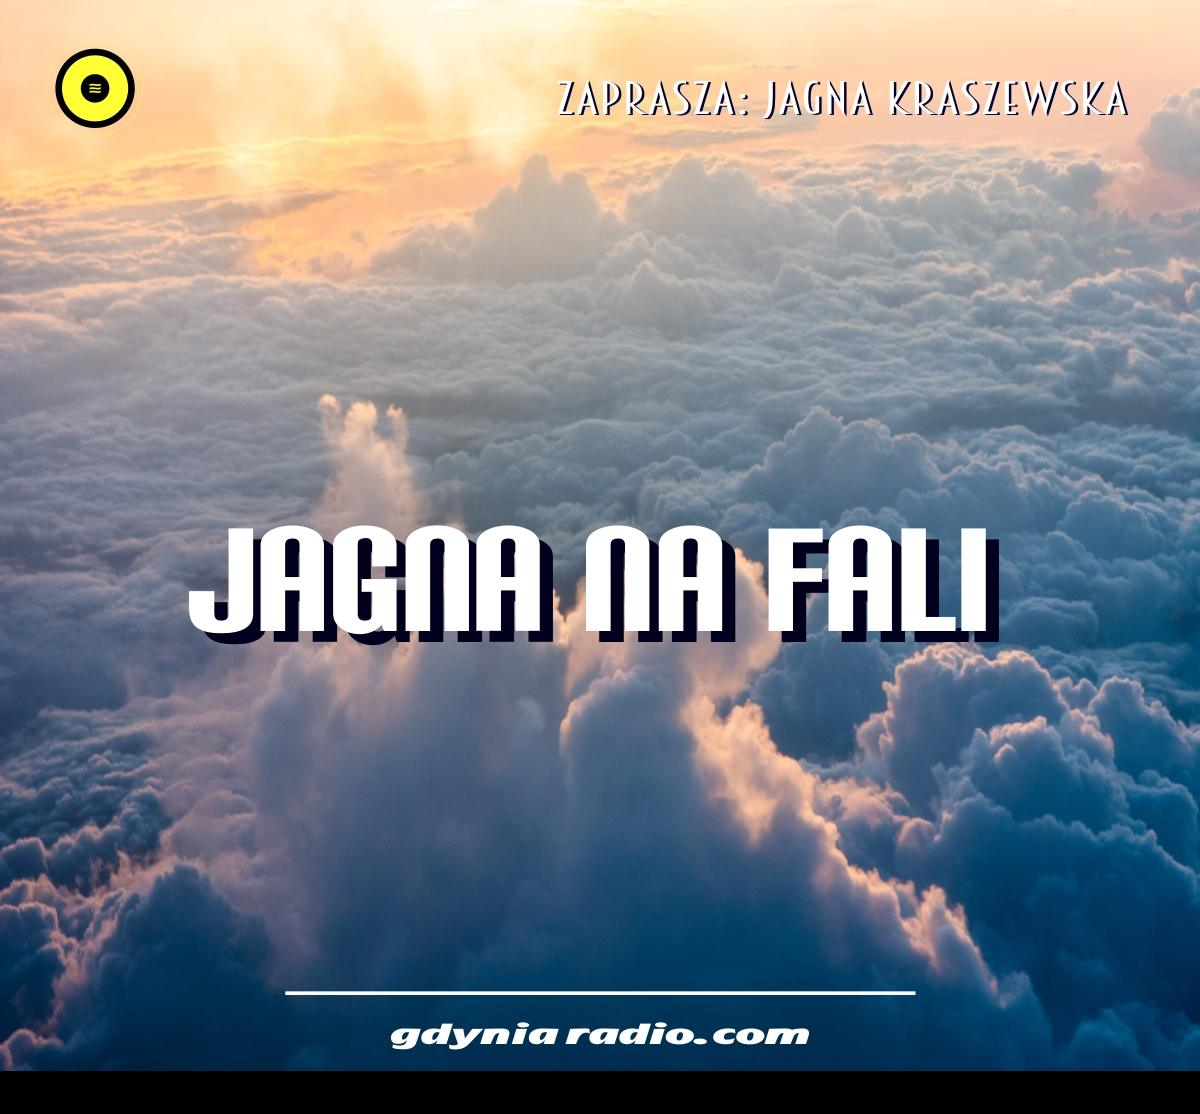 Gdynia Radio -2021- Jagna Na Fali - Jagna Kraszewska